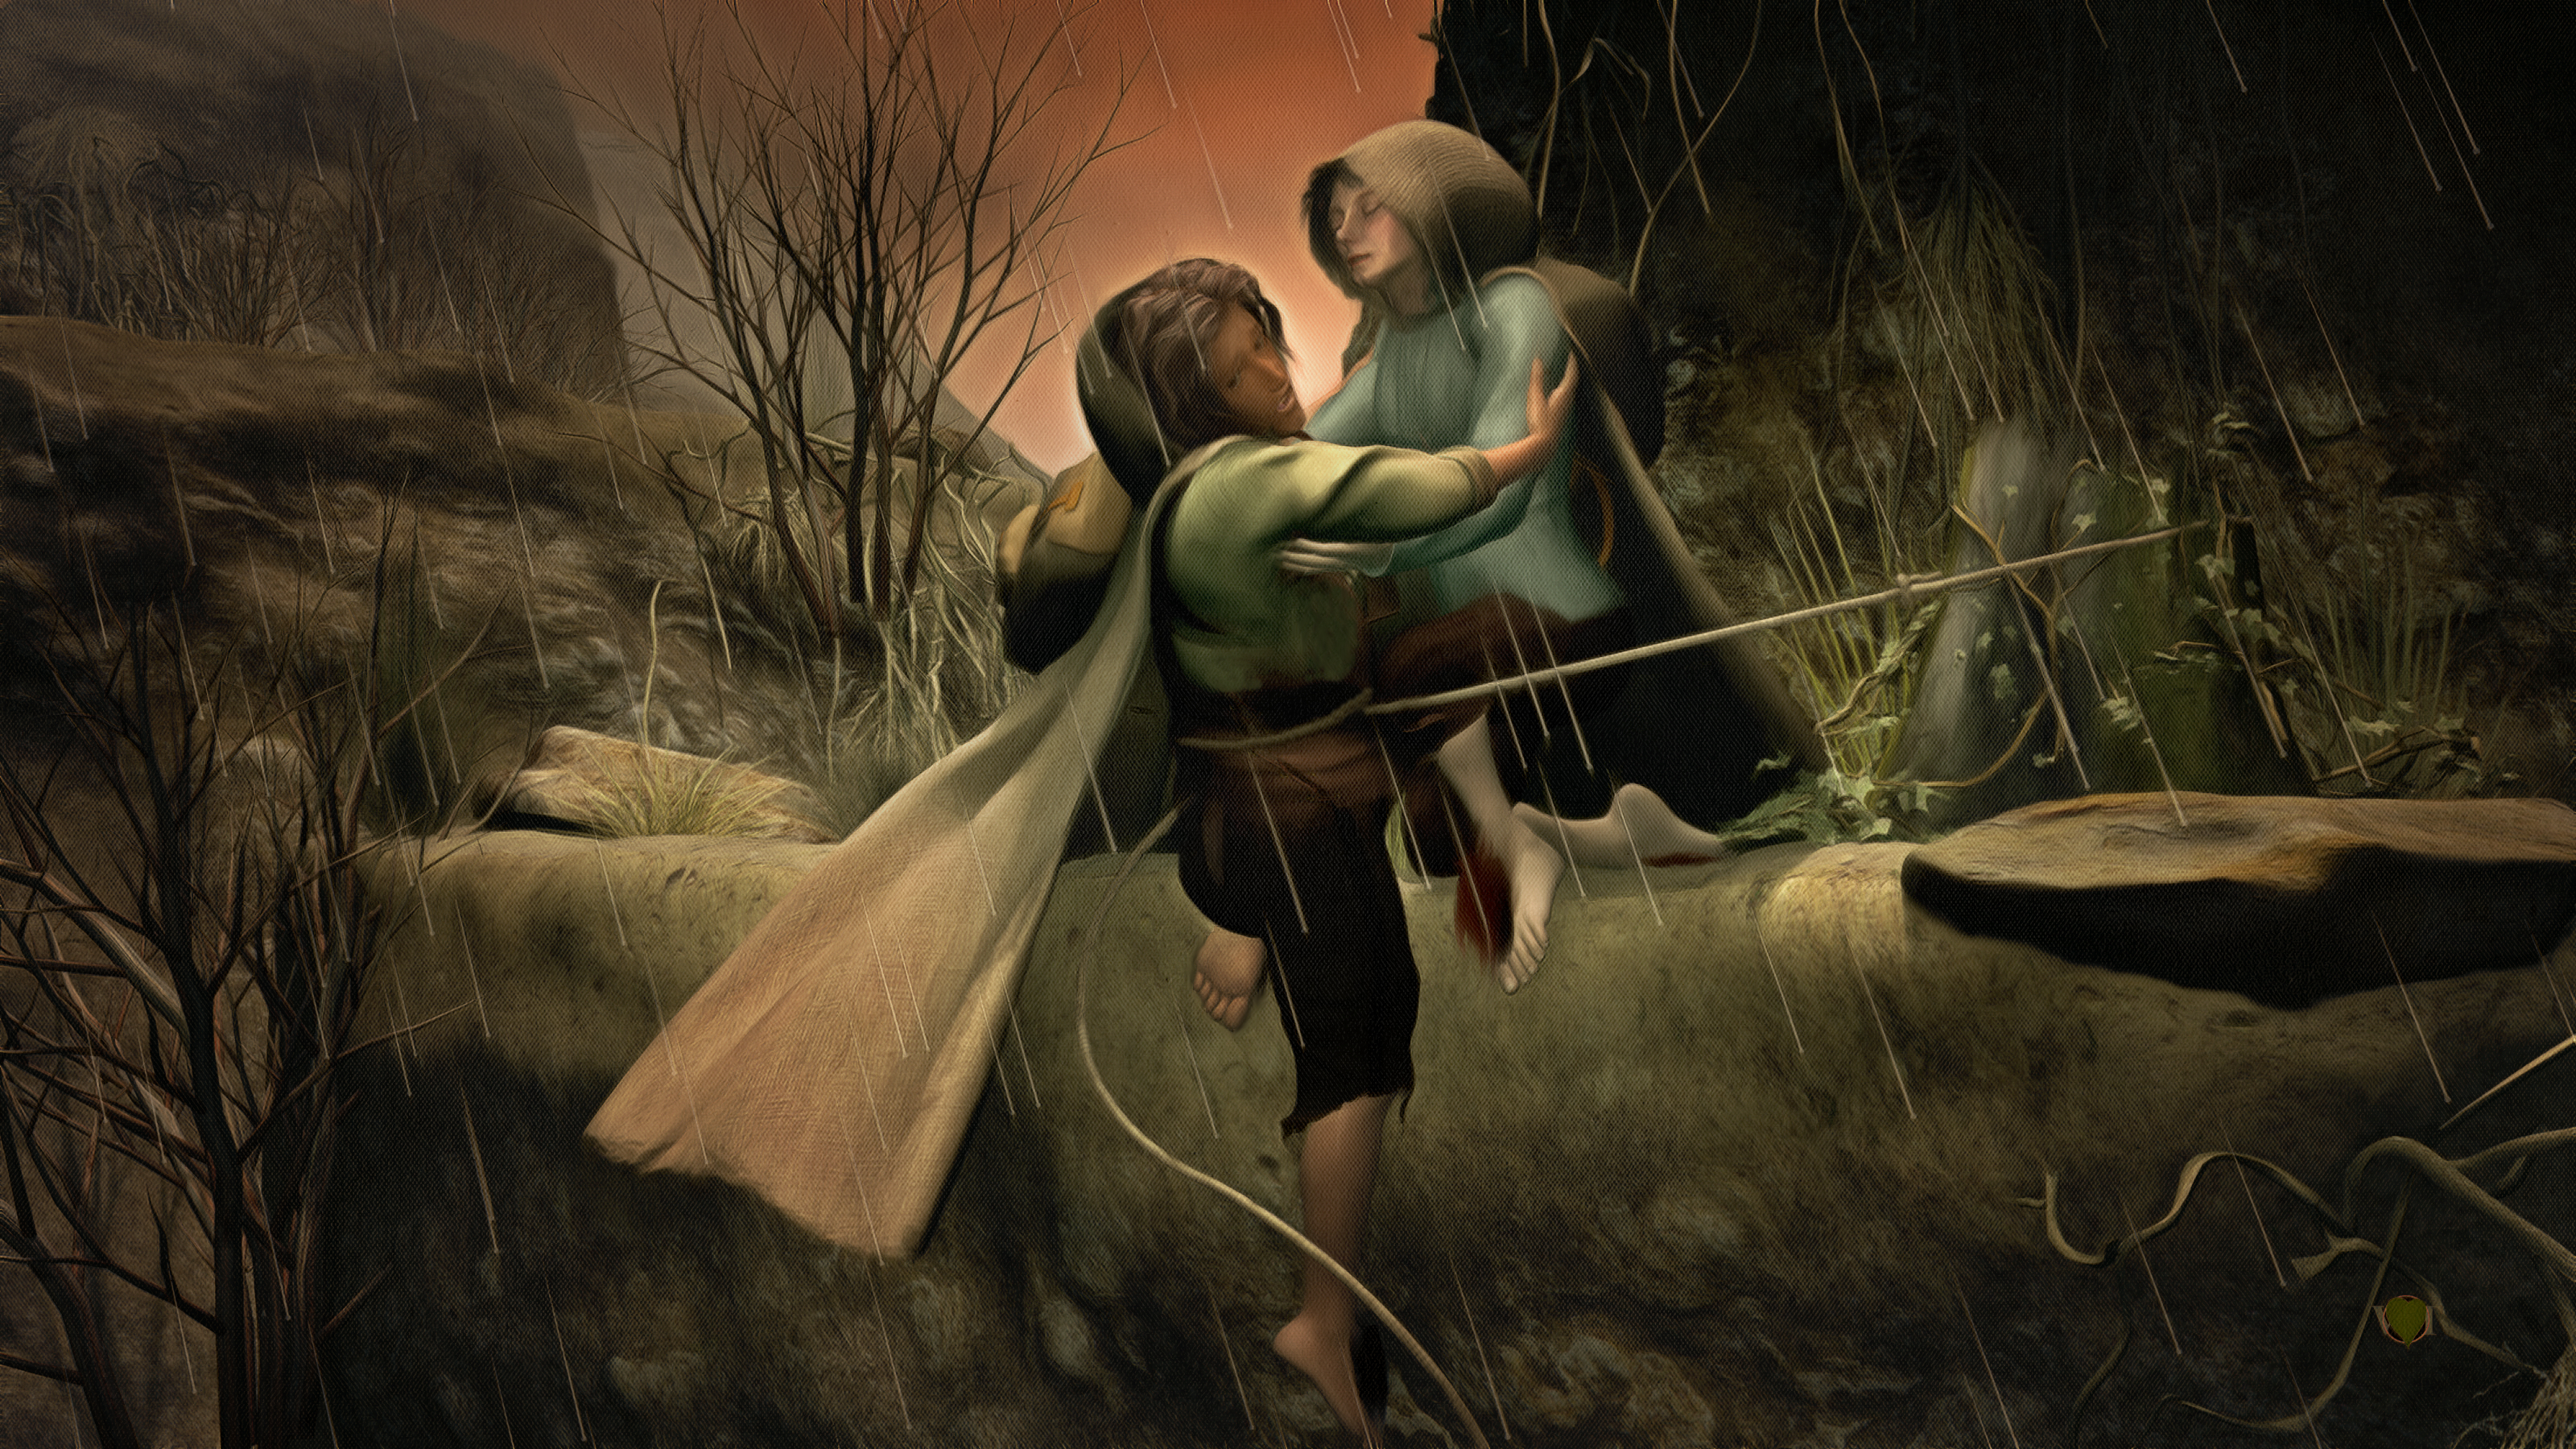 Frodo and Sam climb down the cliff